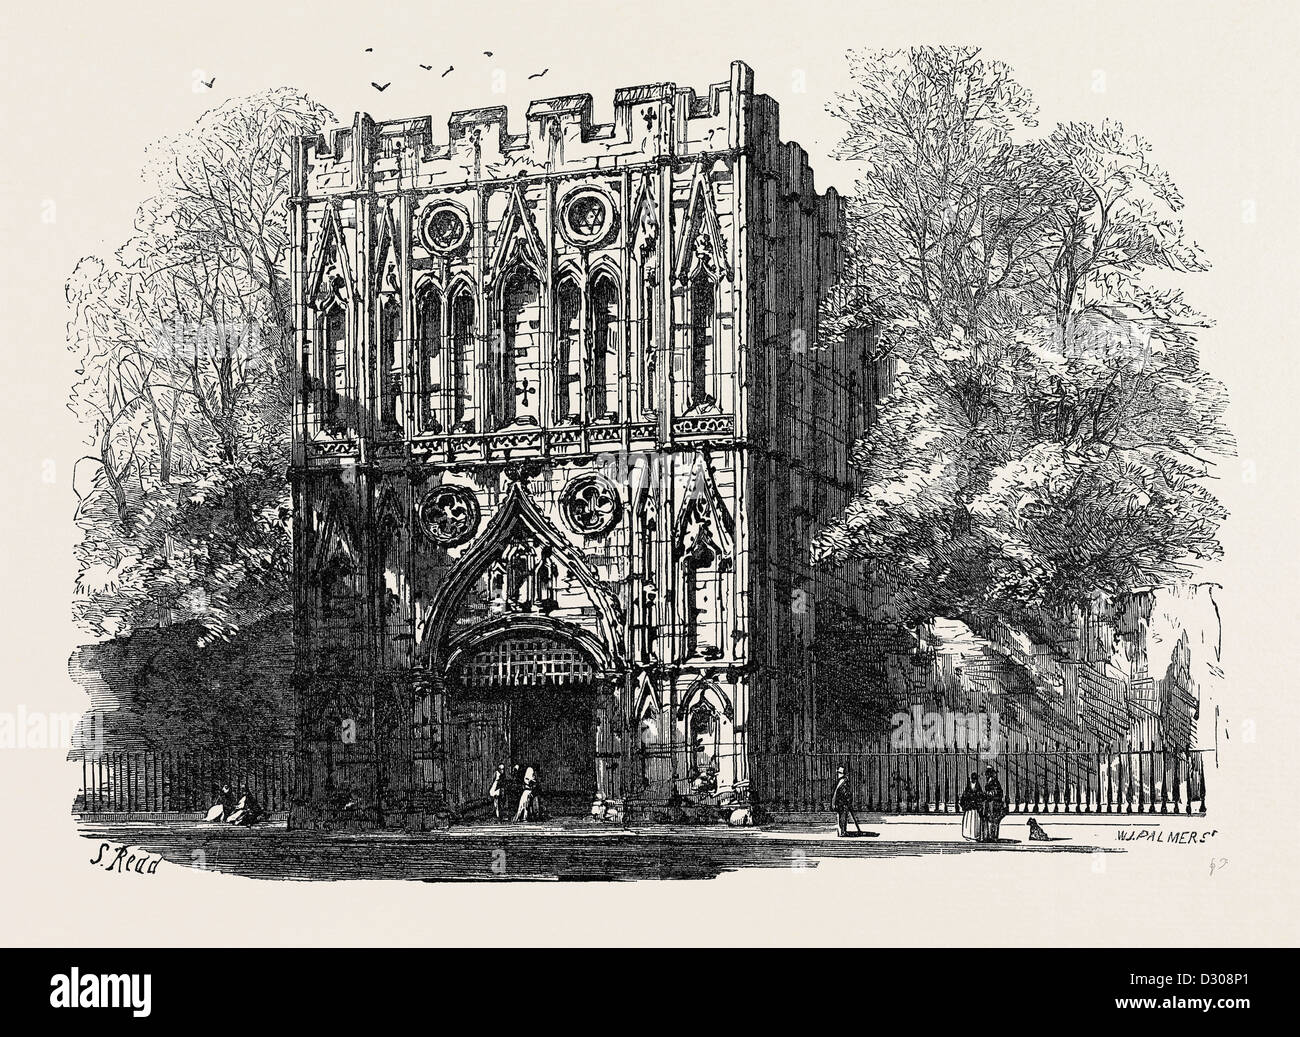 BURY ST. EDMUNDS: THE ABBEY GATE 1867 - Stock Image